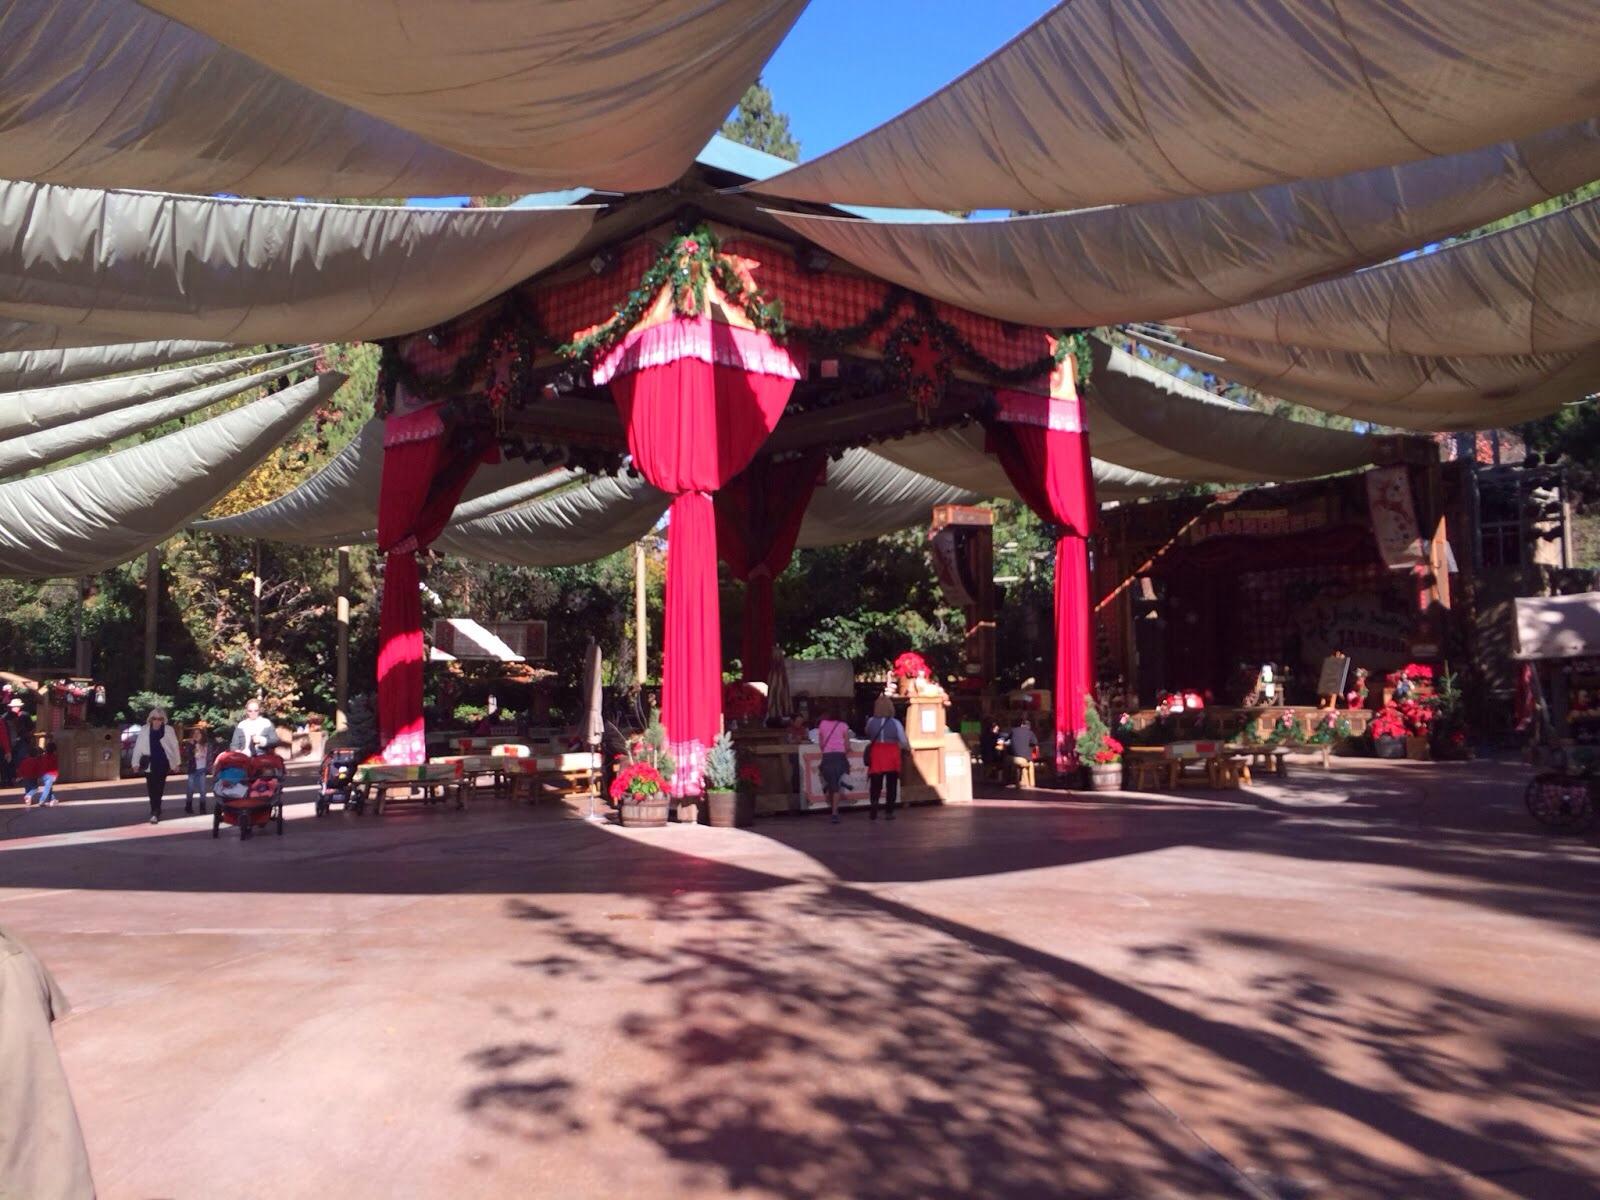 Disneyland Annual Passholder Sing Along Under The Stars in February at Big Thunder Ranch Jamboree